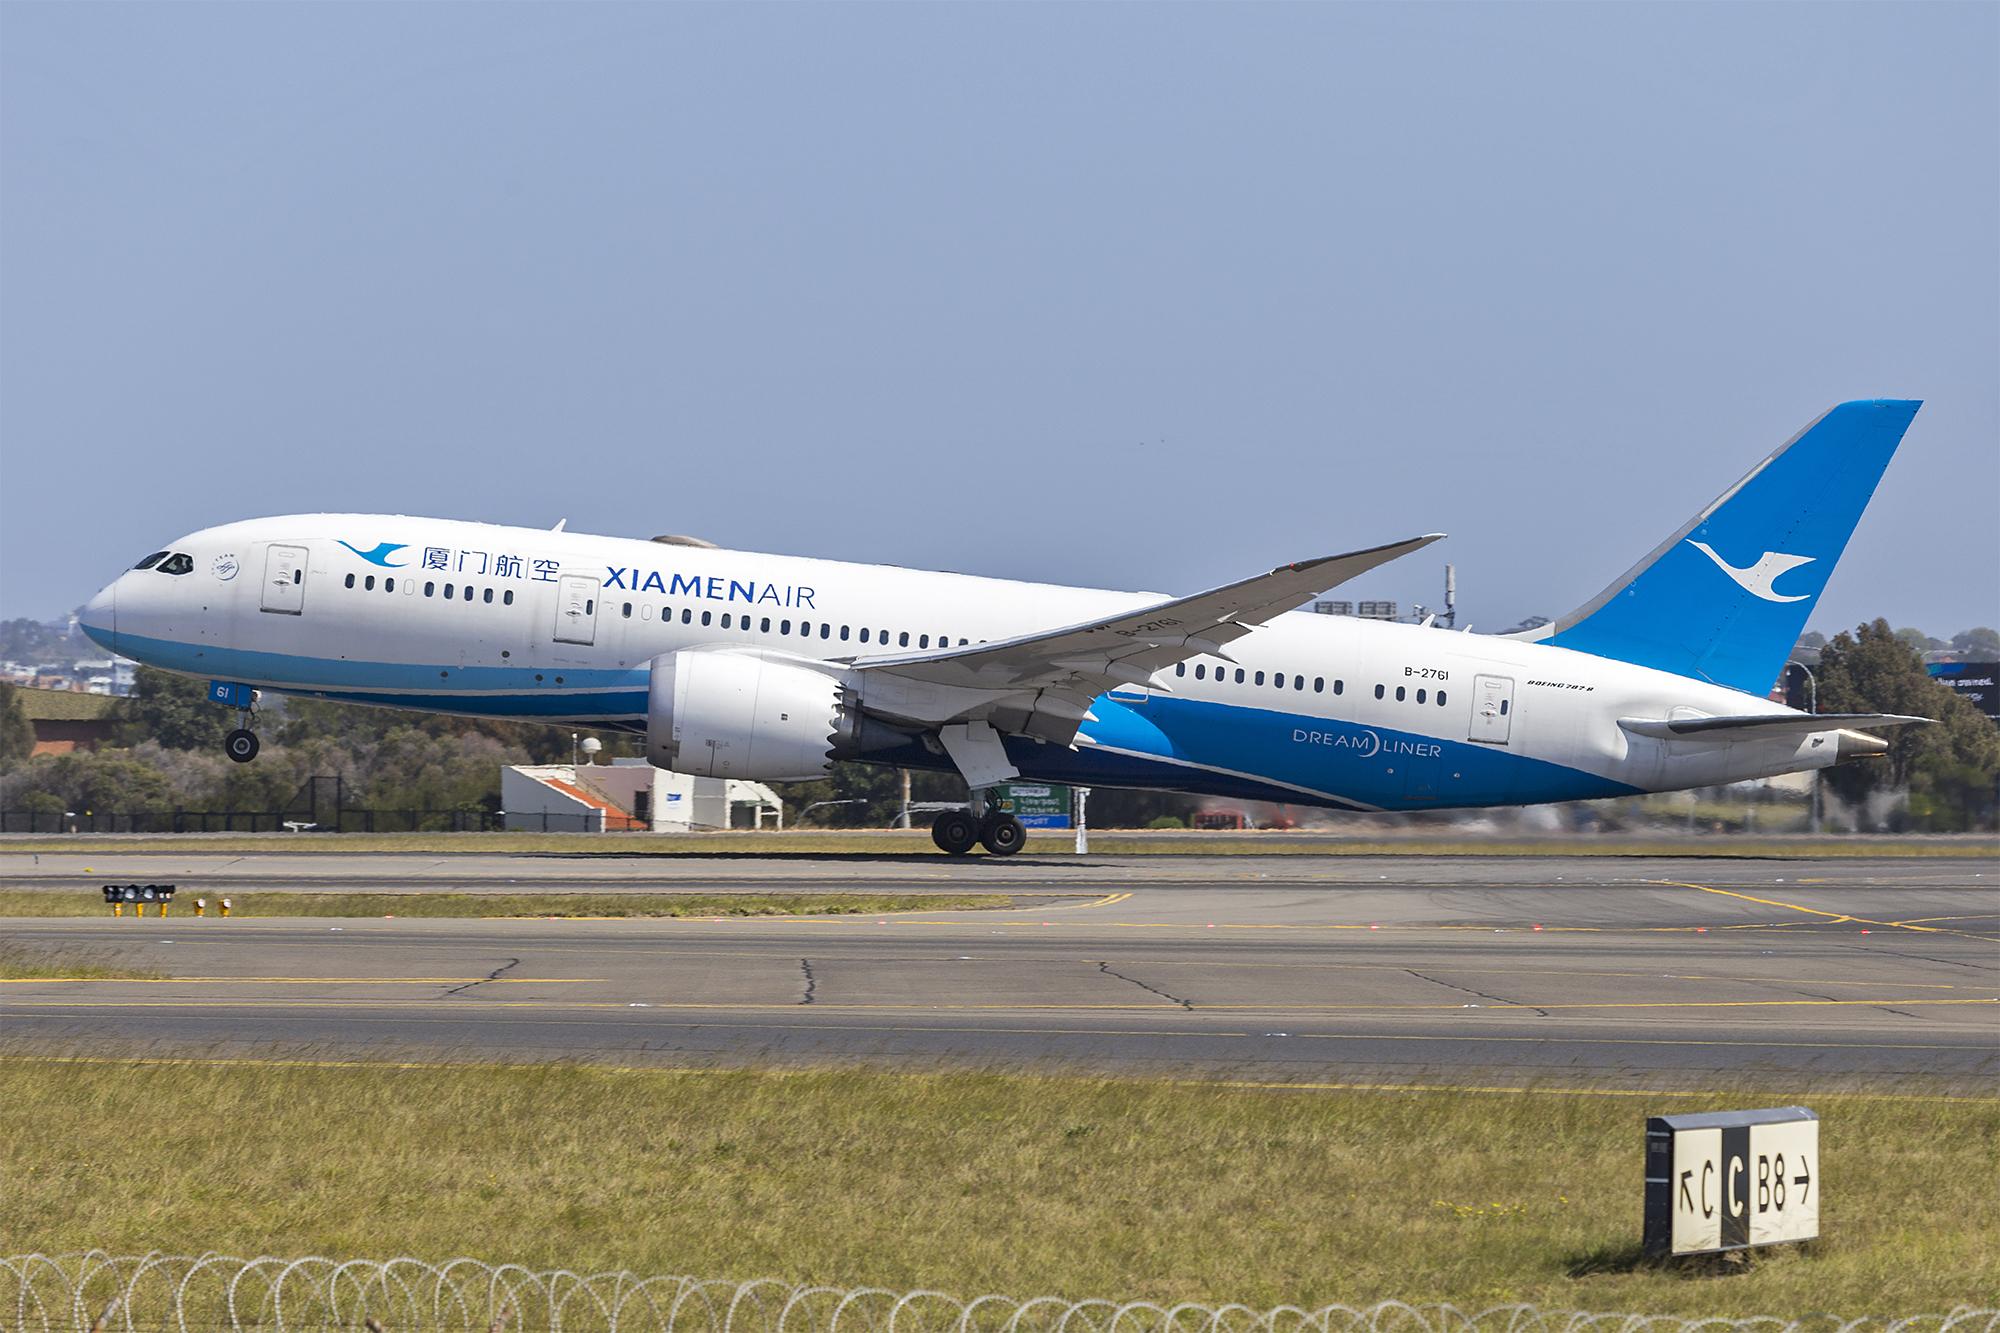 File:Xiamen Air (B-2761) Boeing 787-8 Dreamliner at Sydney